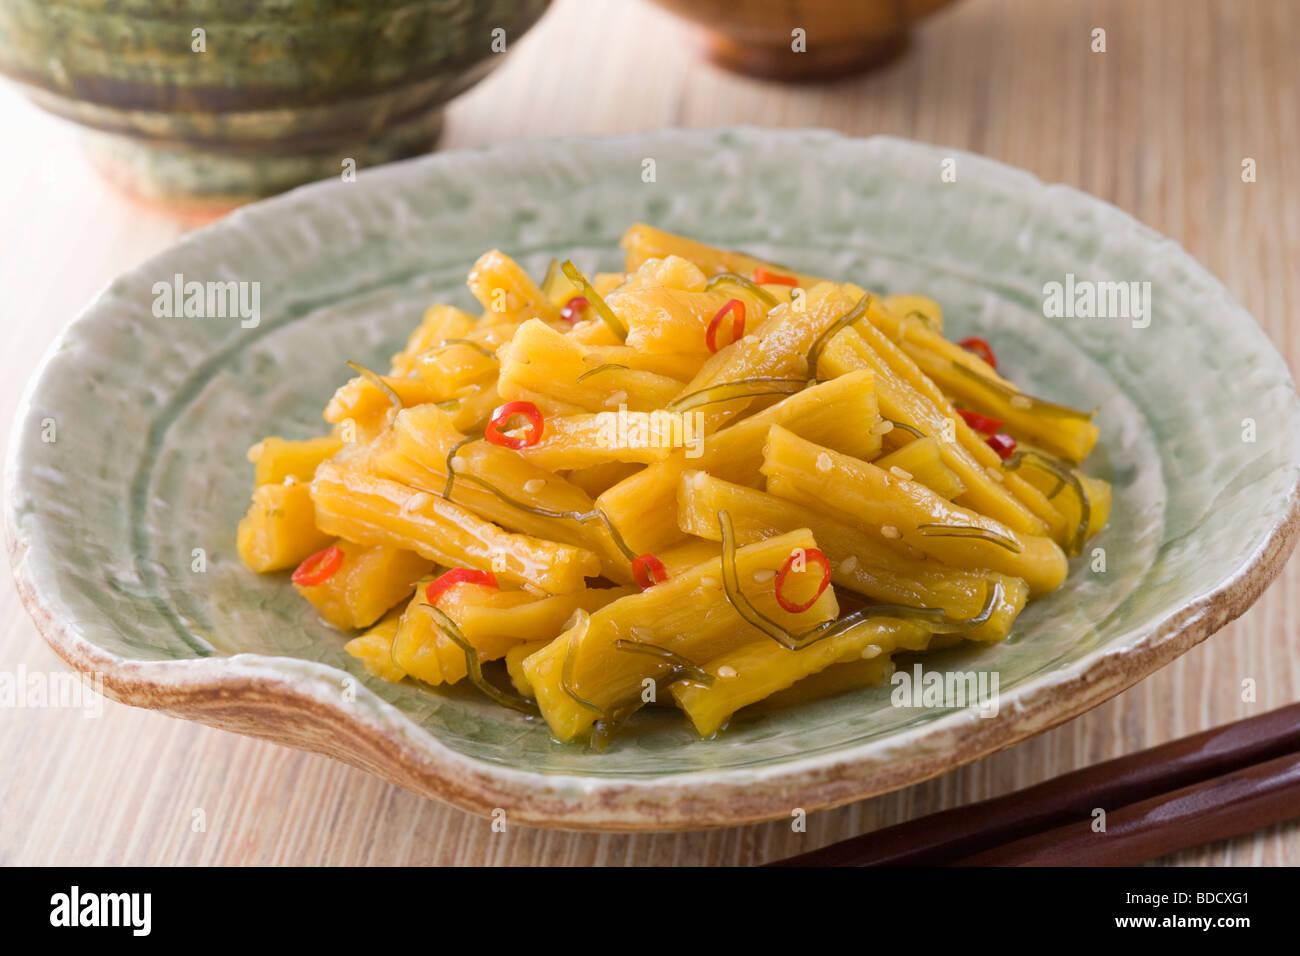 Dried daikon radish pickles - Stock Image